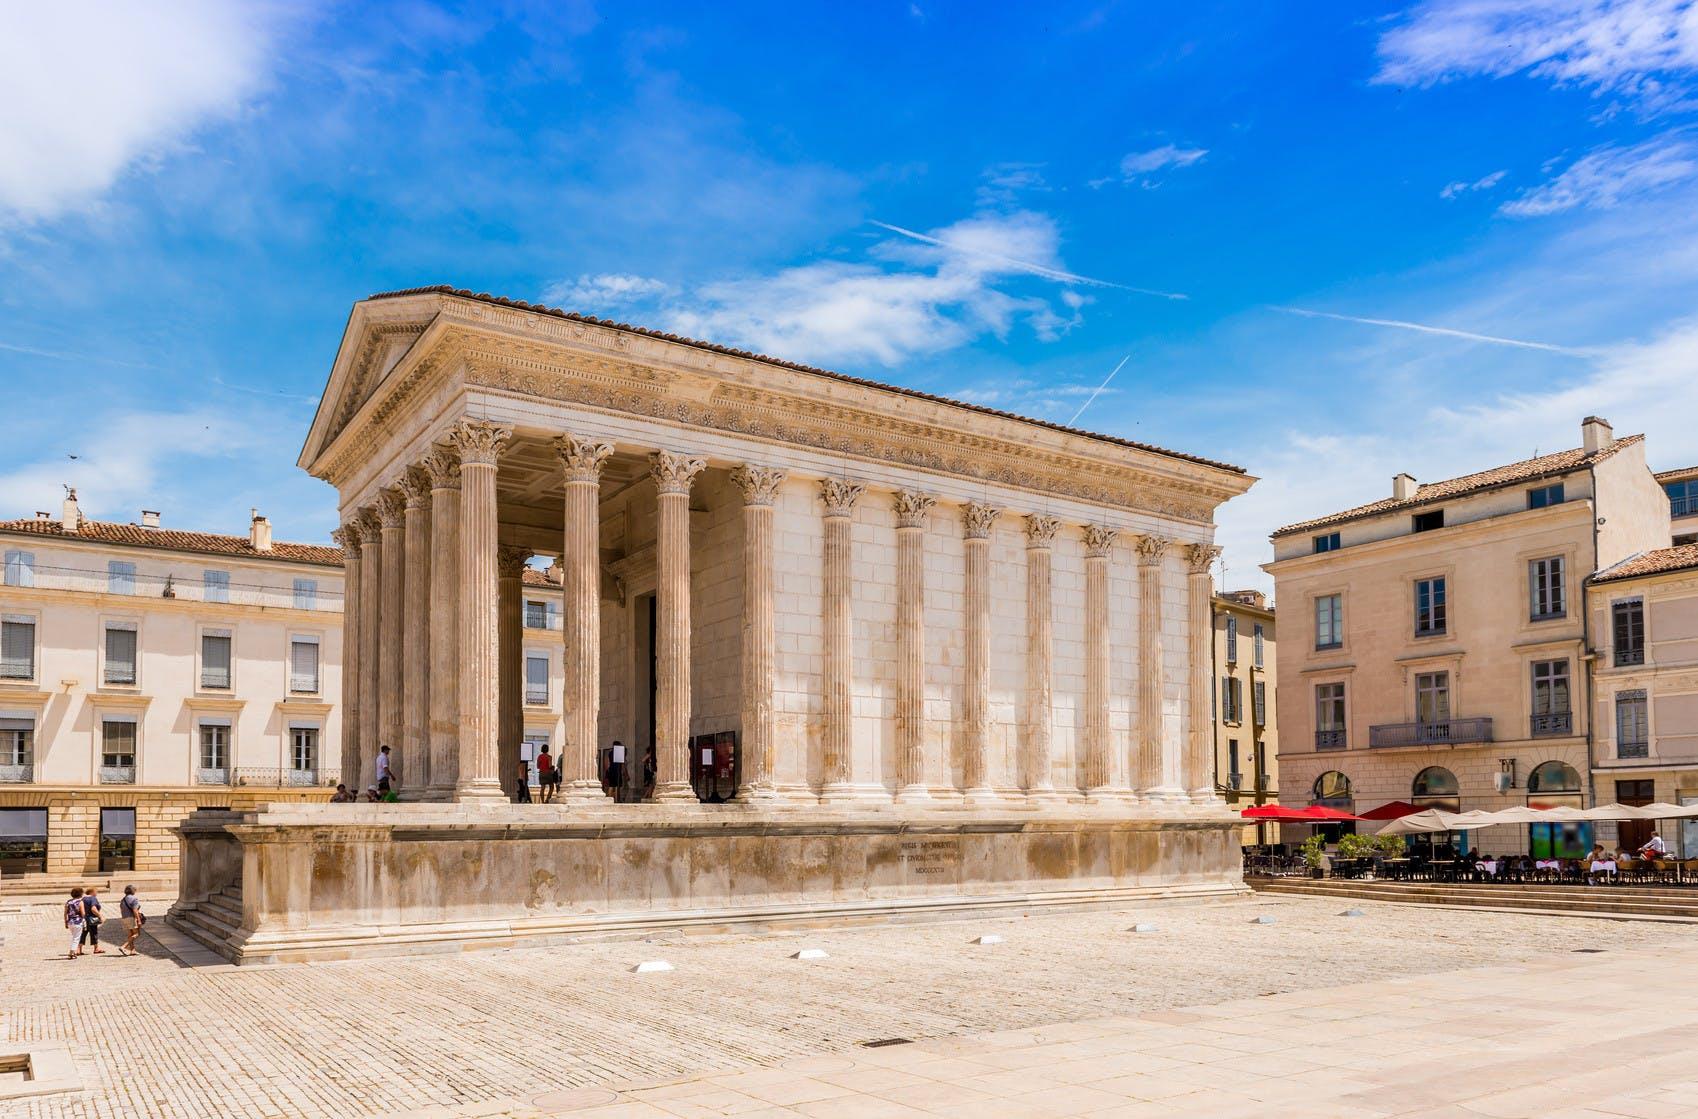 Plaza de Nimes en el Languedoc, Occitanie.jpg casa